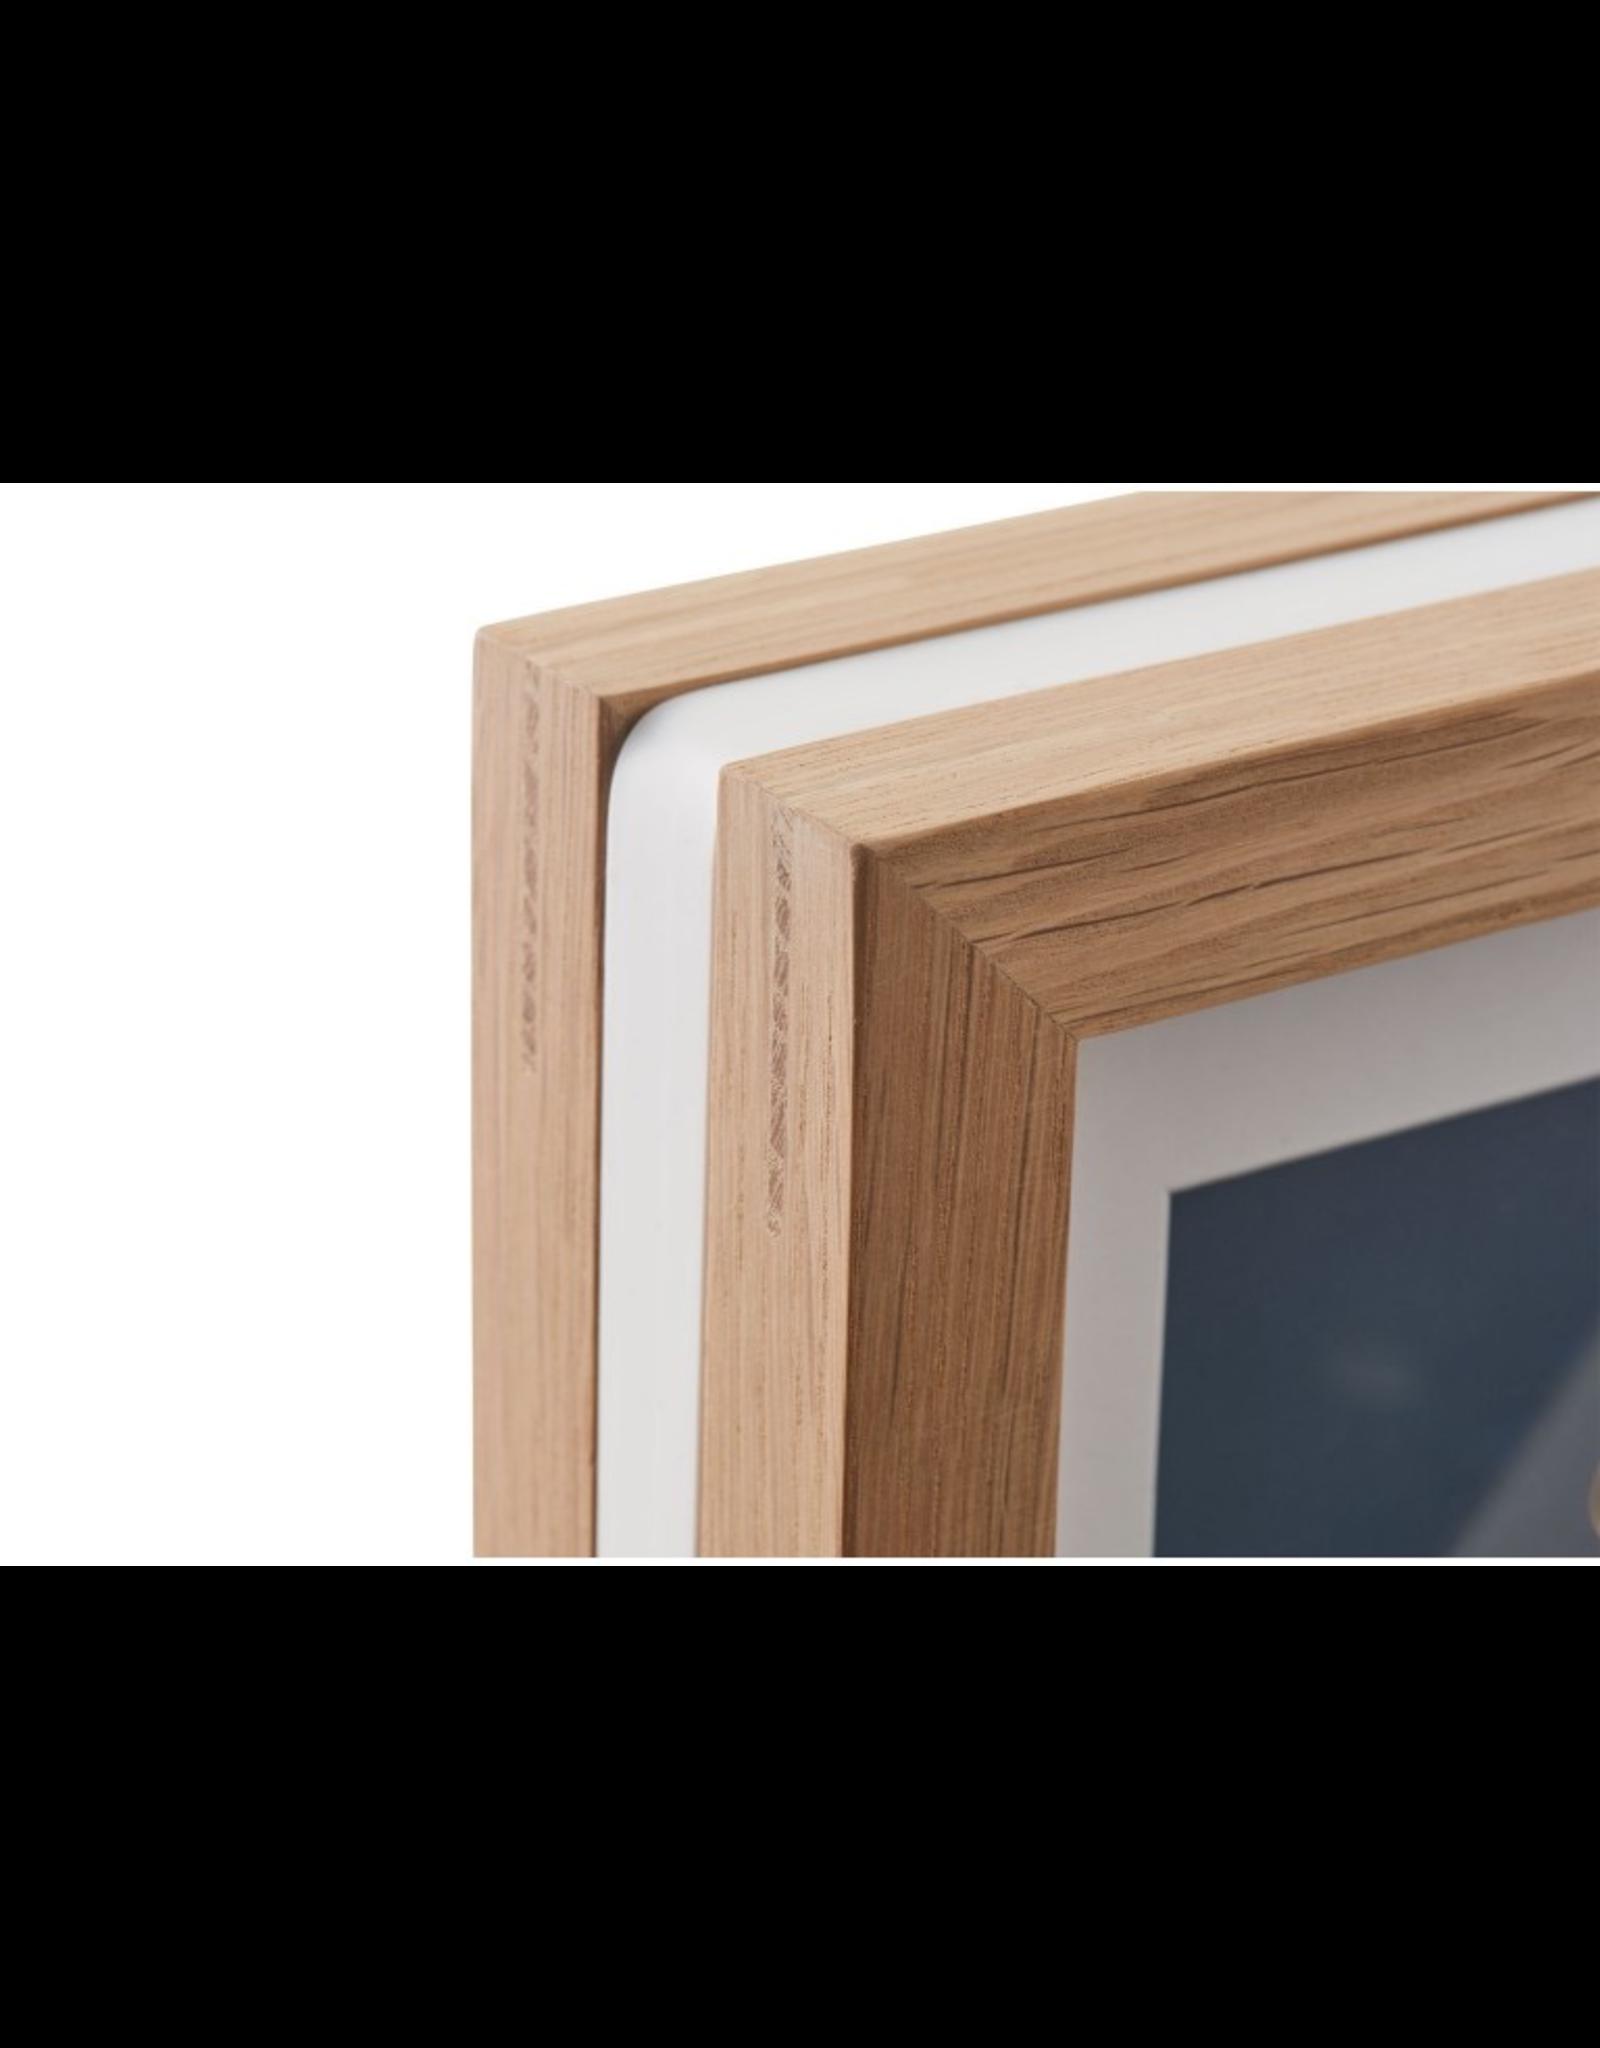 NAV Scandinavia CHANGE Multi Frame 1pcs - Natural White Oak